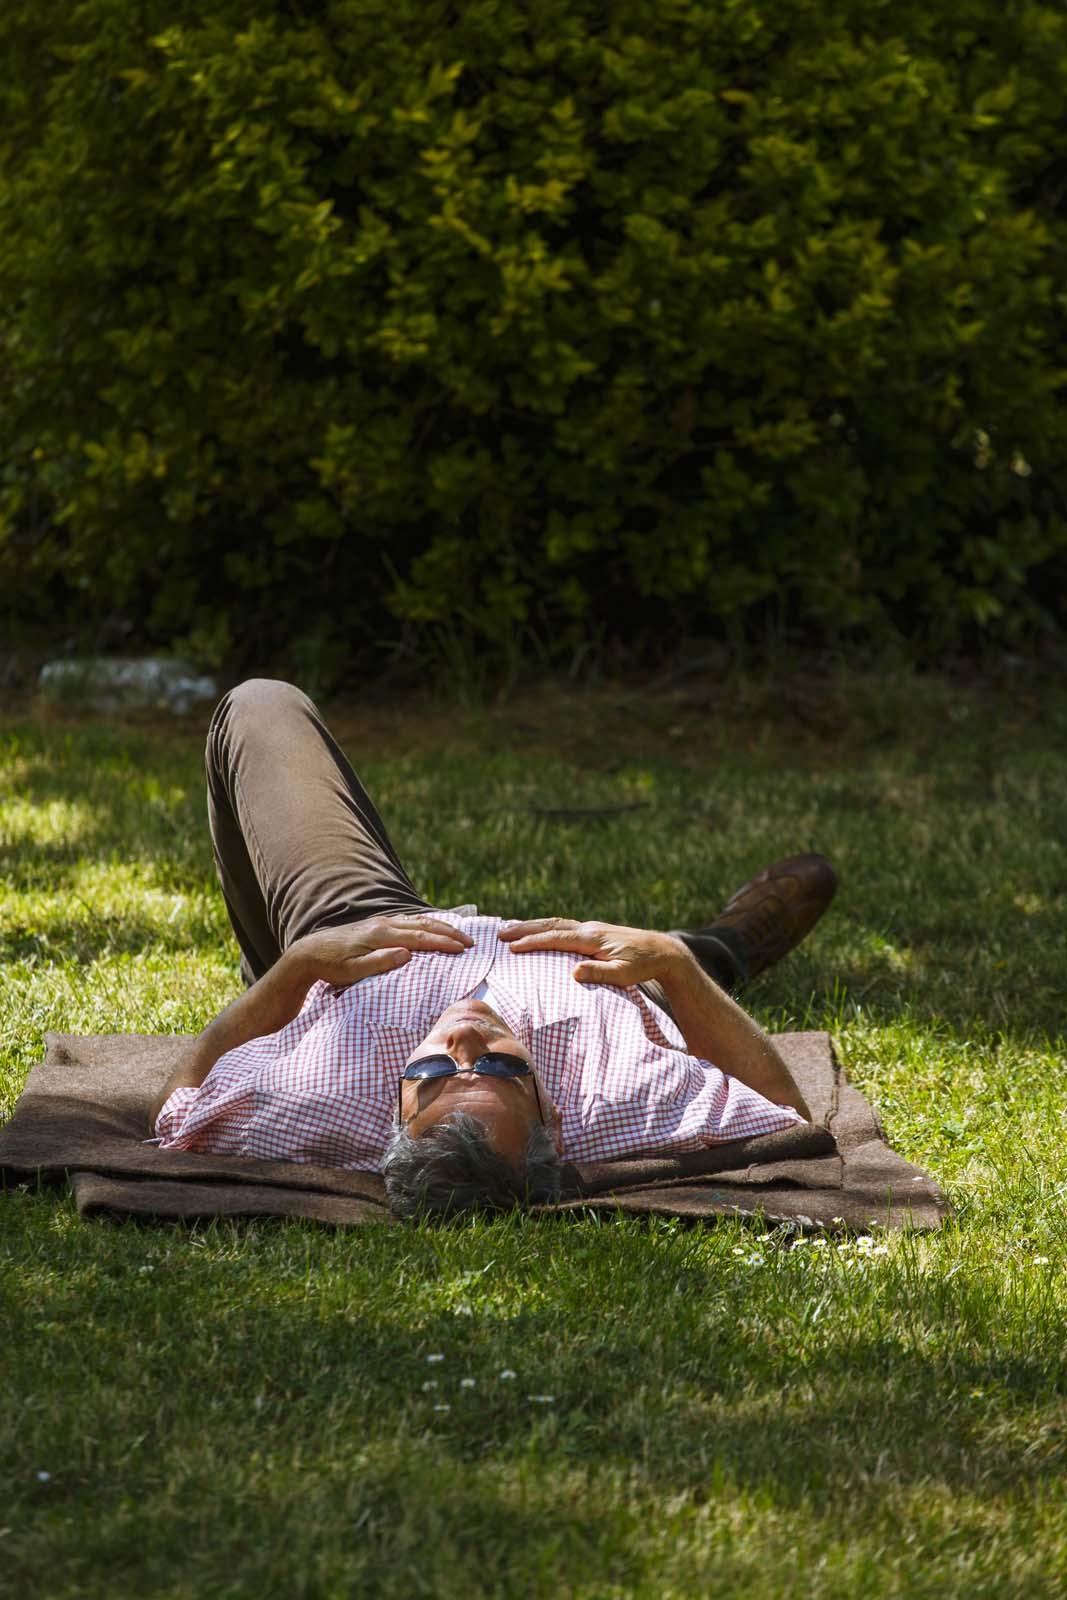 La pause sur nos aires de repos